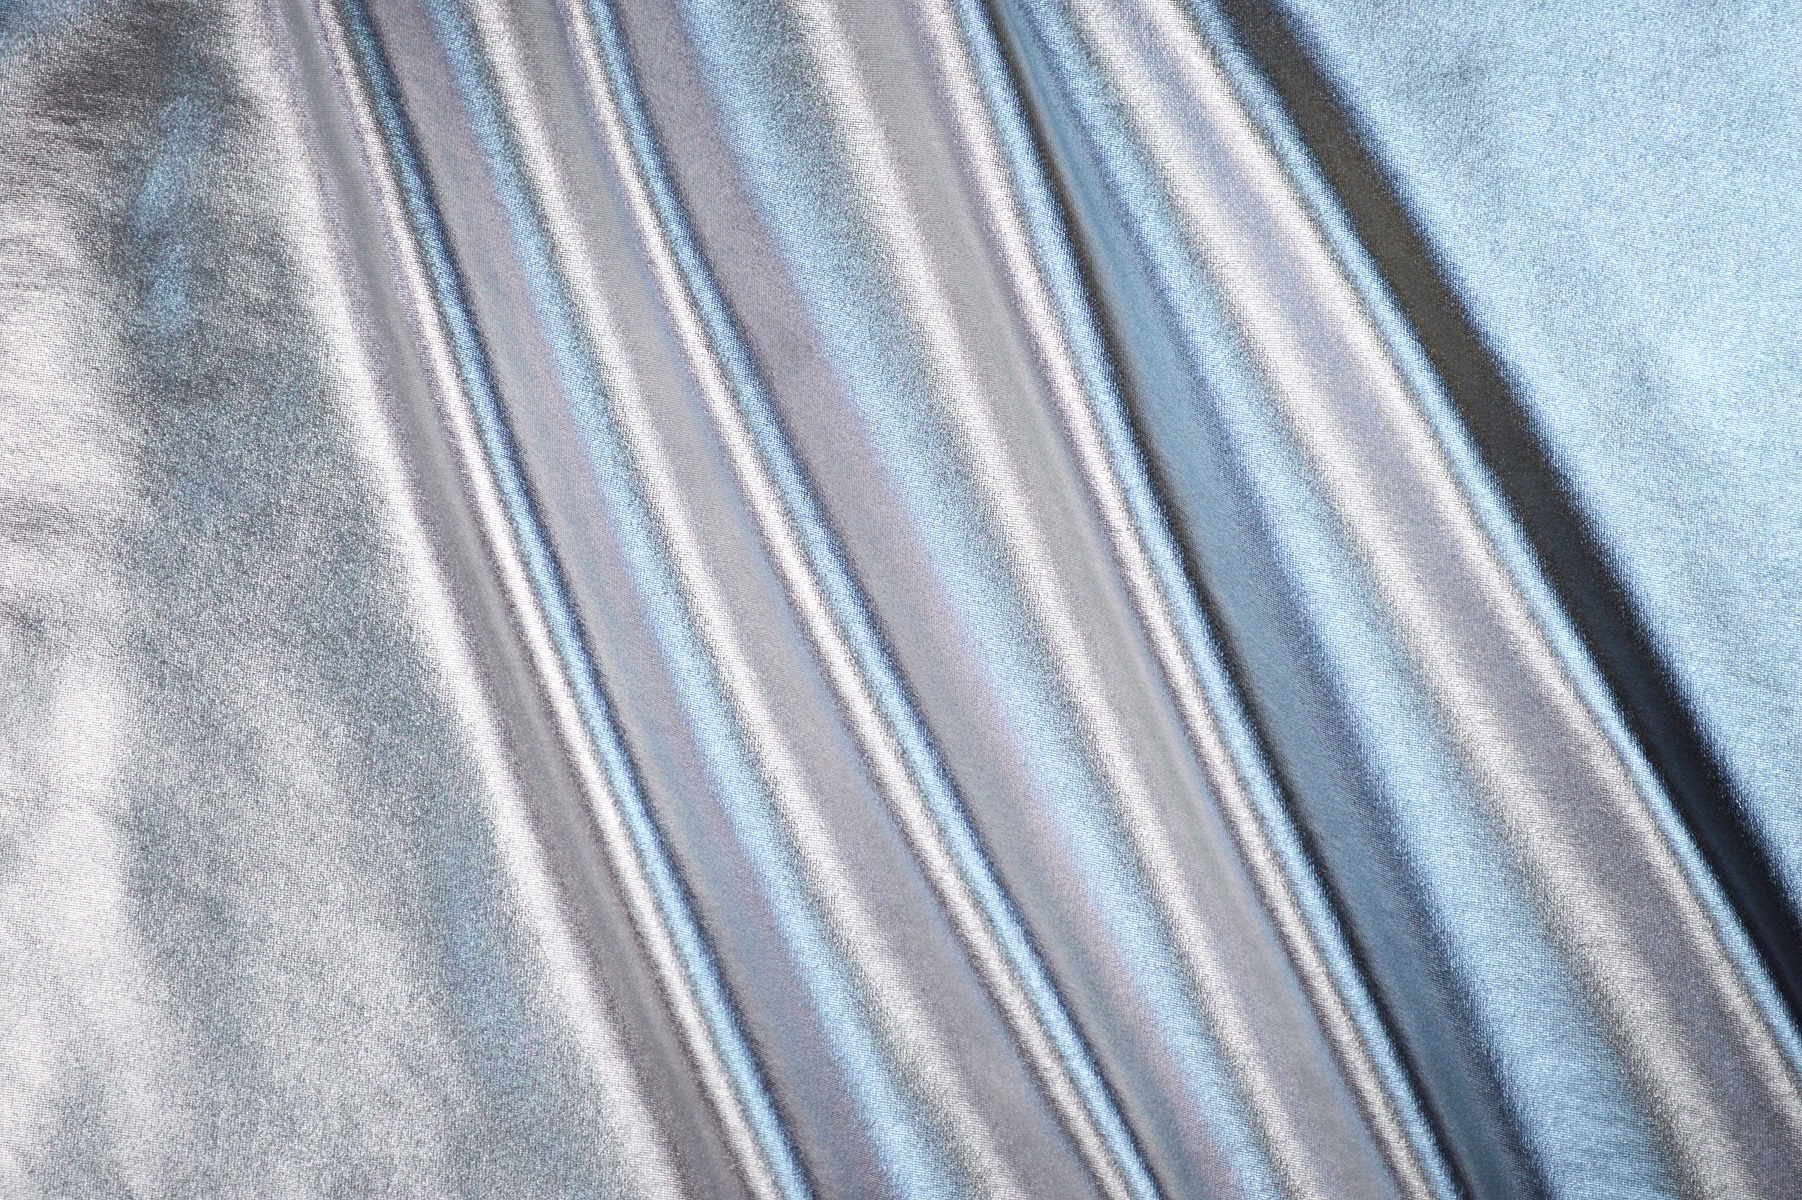 Stretch Metallic Spandex Silver